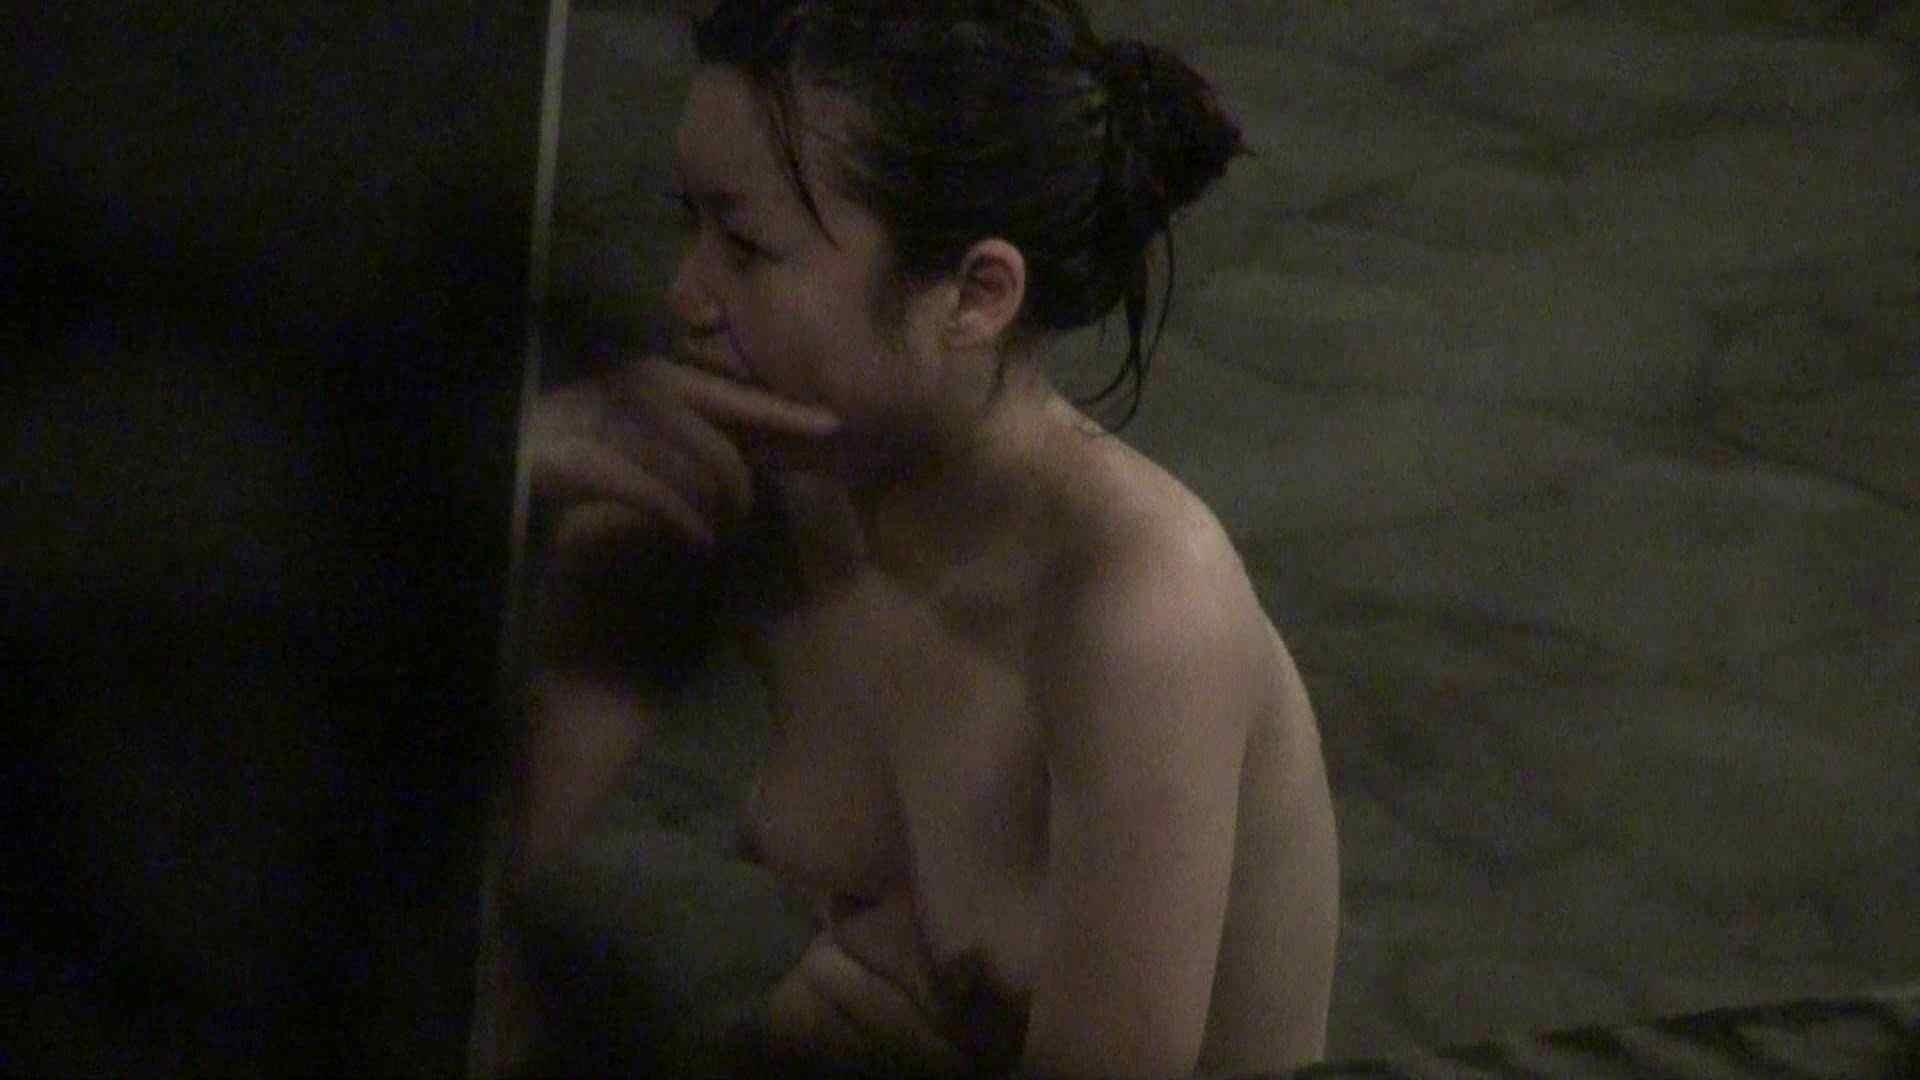 Aquaな露天風呂Vol.342 OLすけべ画像 | 露天  96連発 13